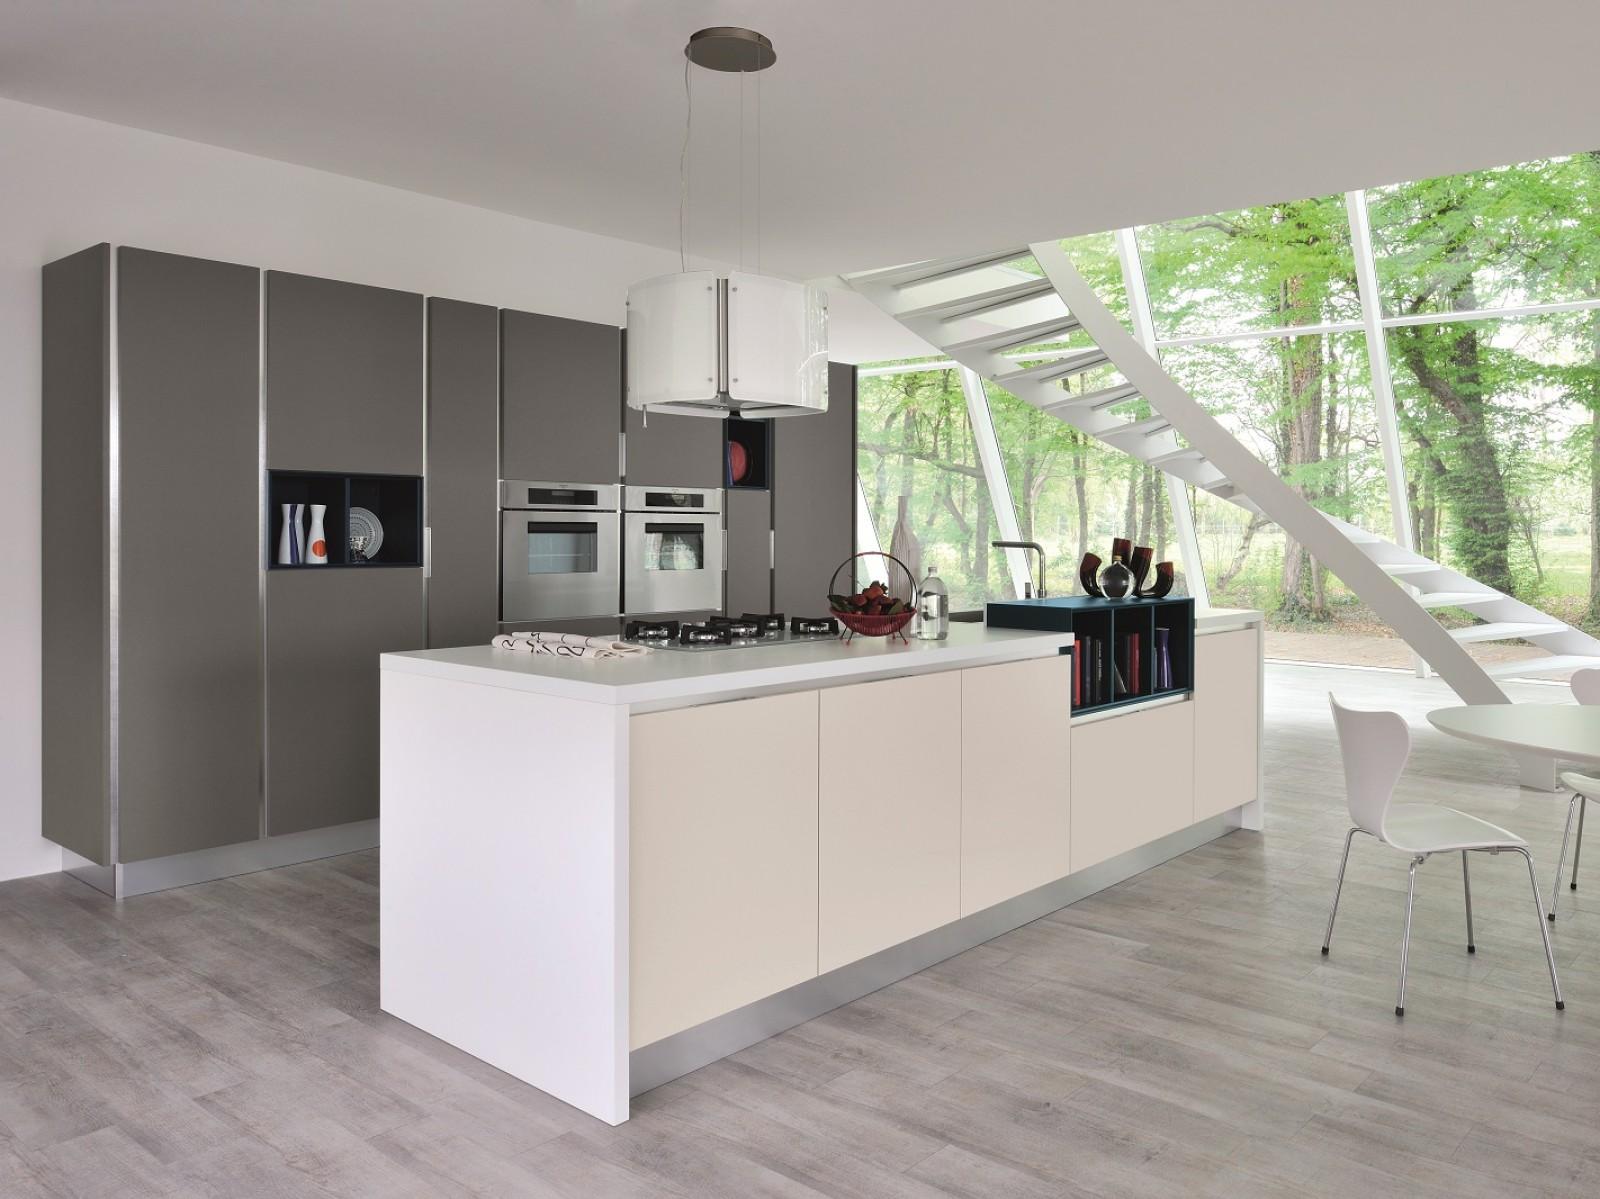 Proposte d 39 arredo cucine cucina essenza lube di cucine for Cucine low cost roma